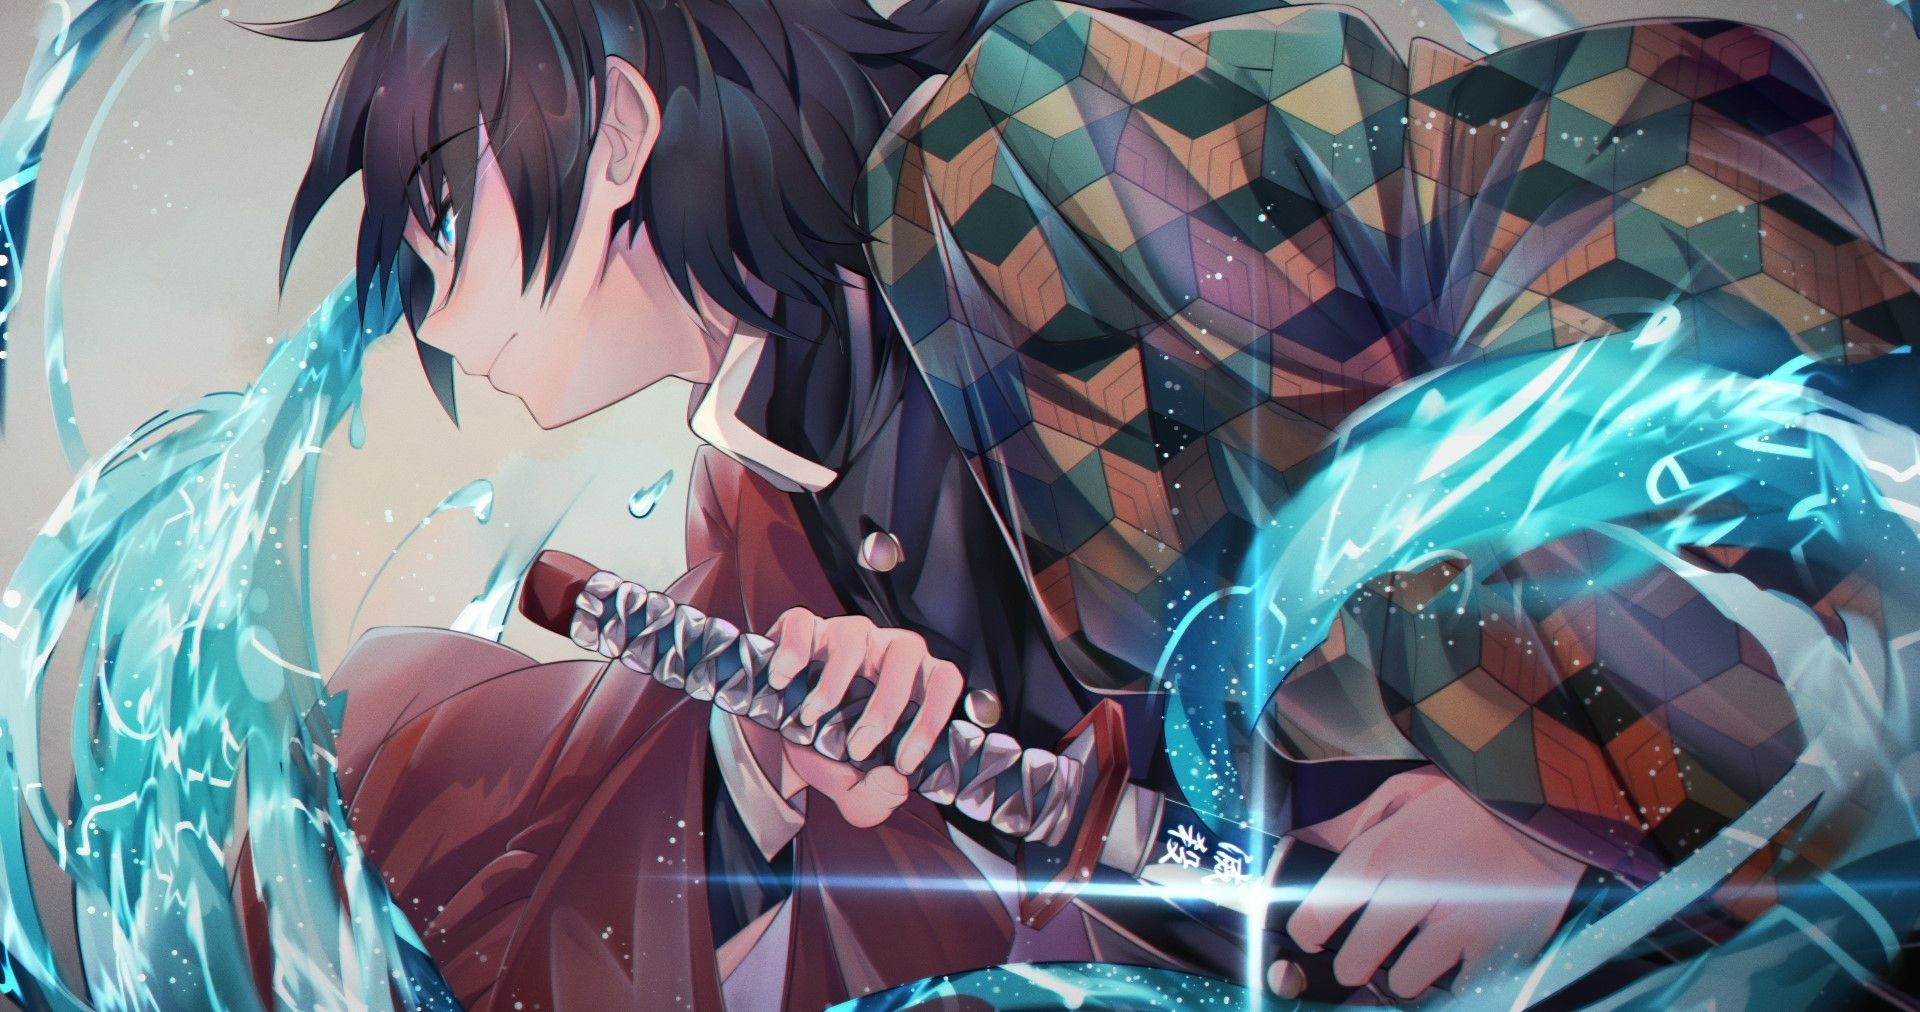 Download 1920x1012 Tomioka Giyuu Kimetsu No Yaiba Sword Profile View Wallpapers Wallpapermaiden Anime Images Anime Anime Demon